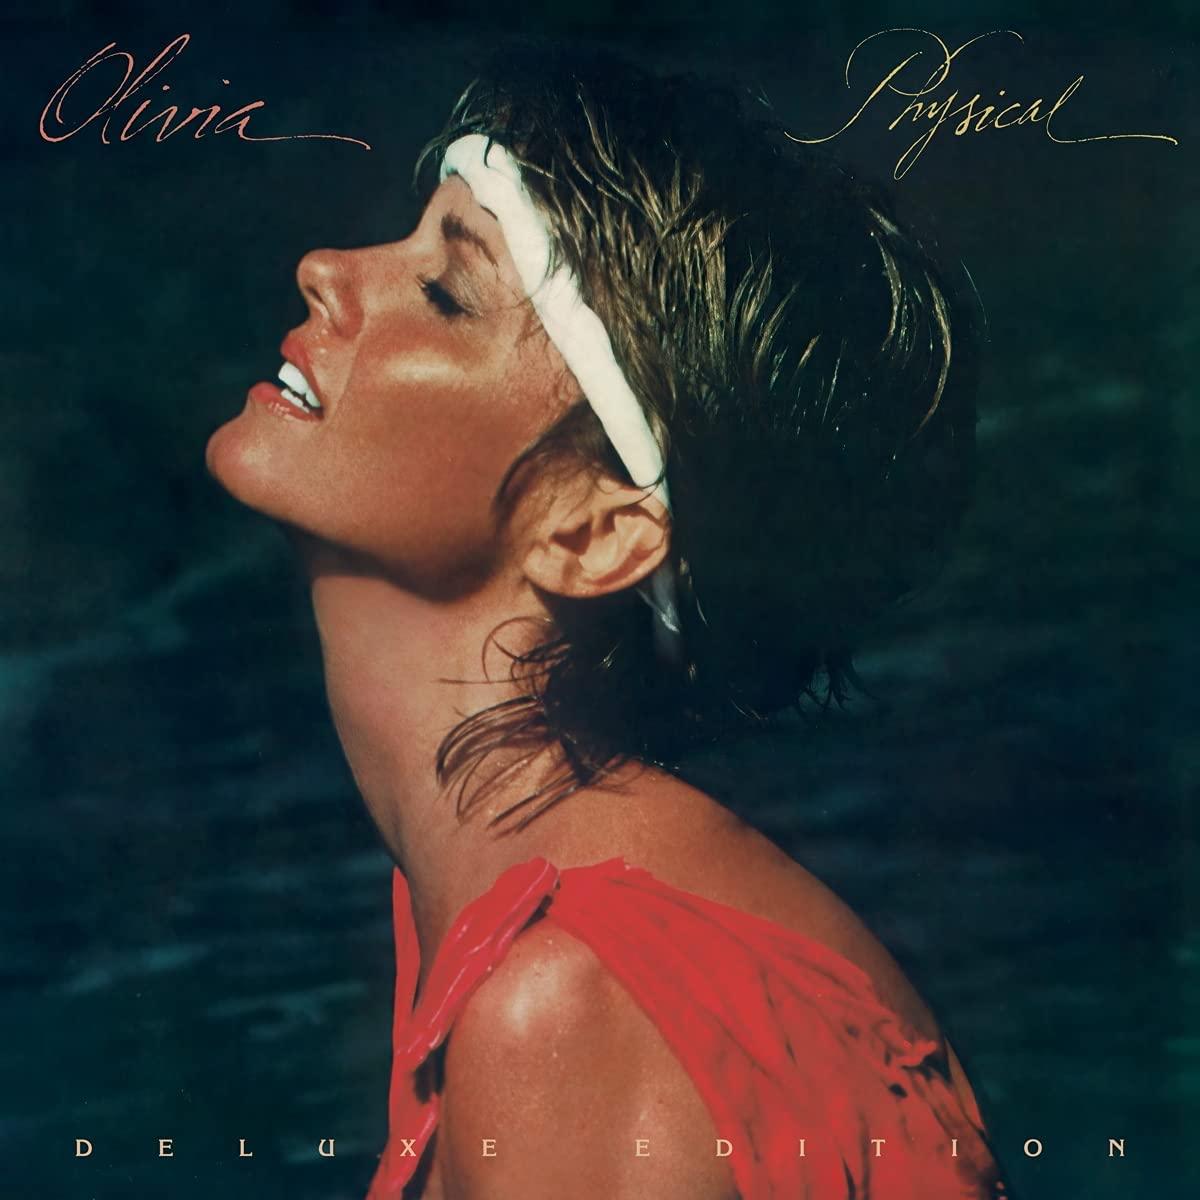 Olivia Newton-John / Physical 40th anniversary deluxe edition